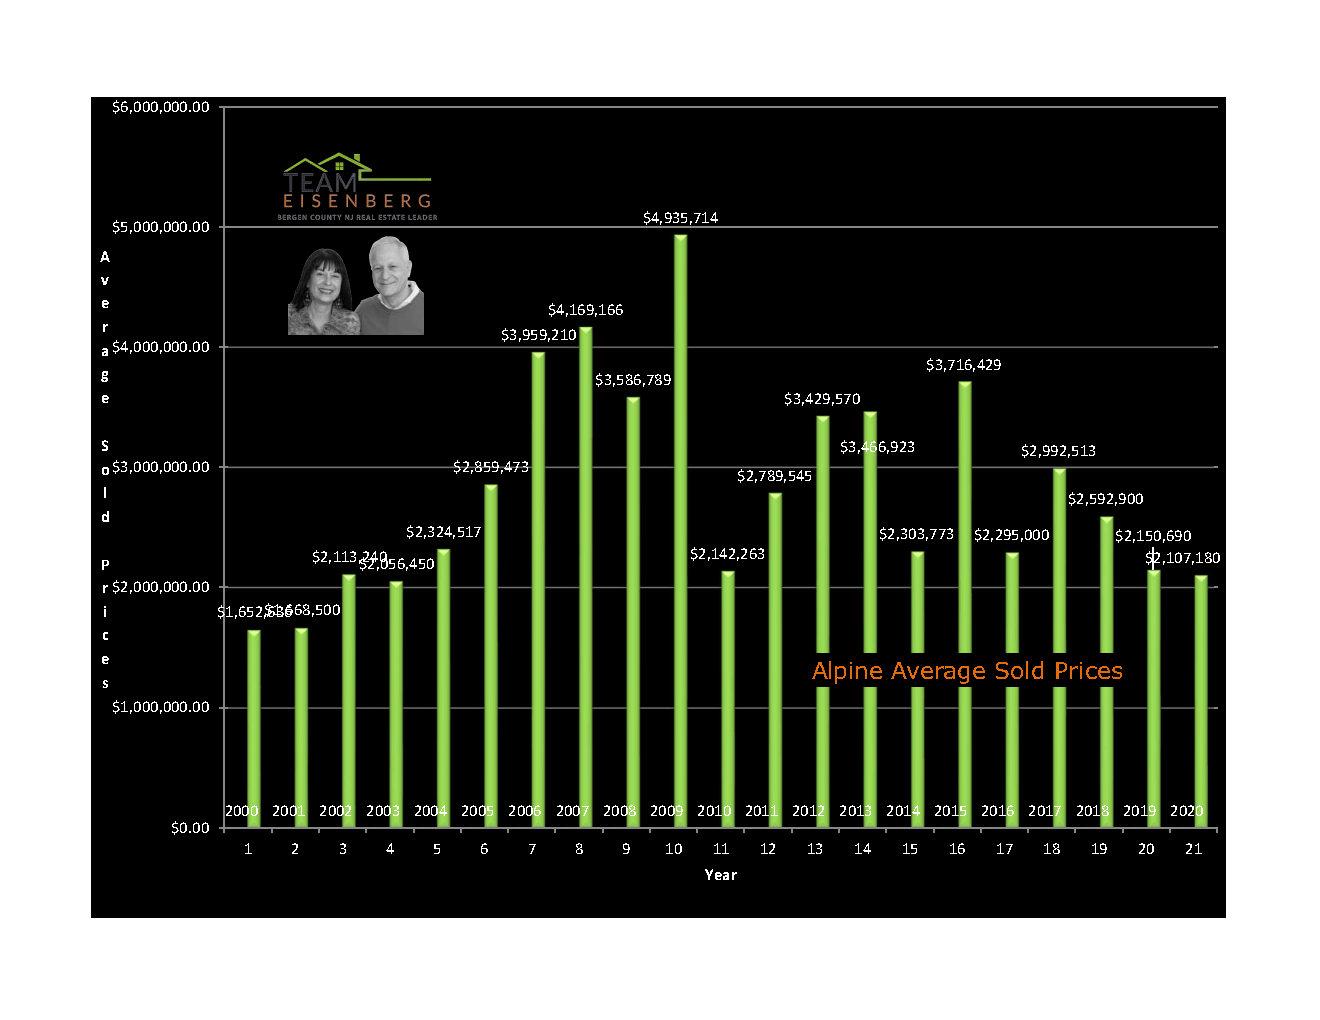 Alpine | Average Sold Prices | 2000-2020